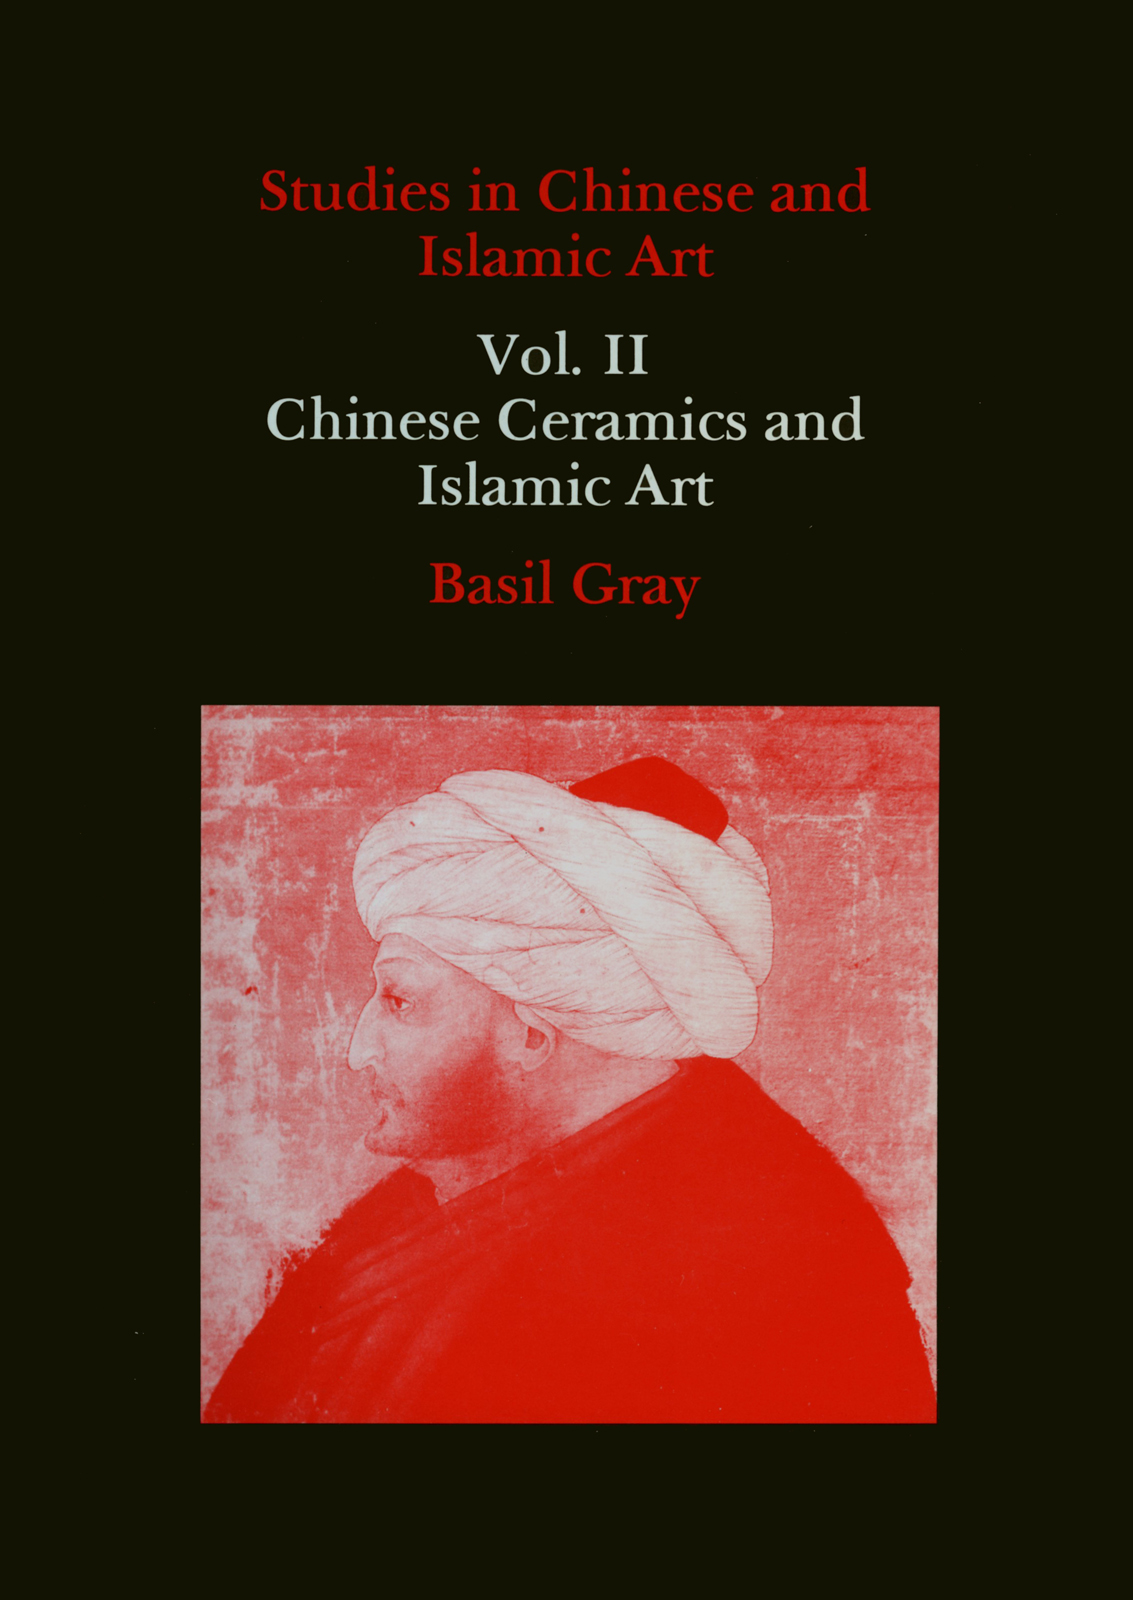 Basil Gray